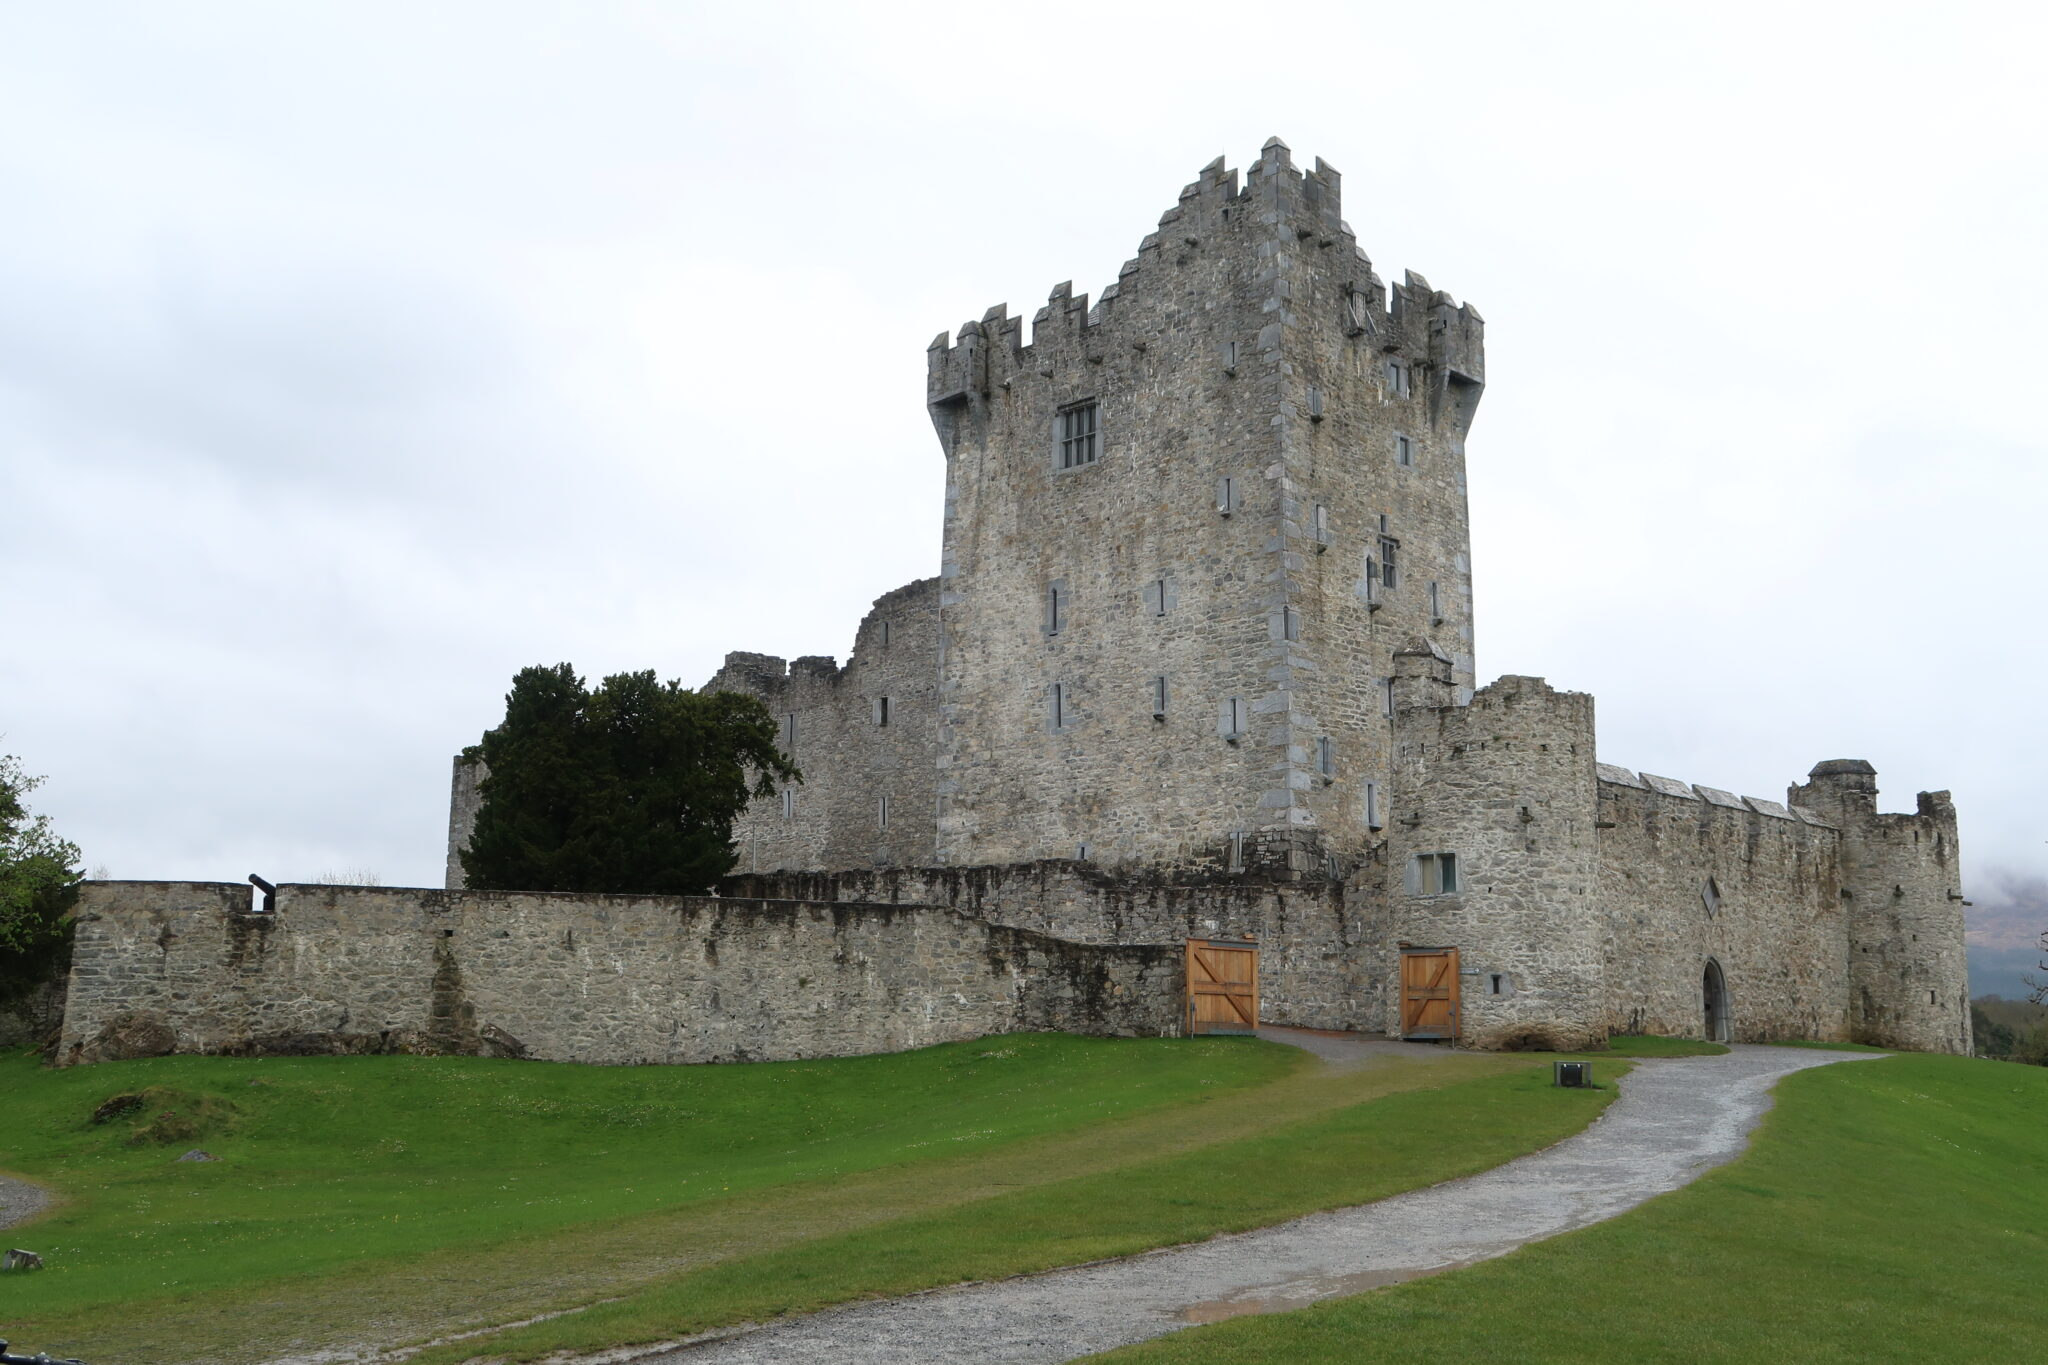 One Week in Ireland Travel Guide